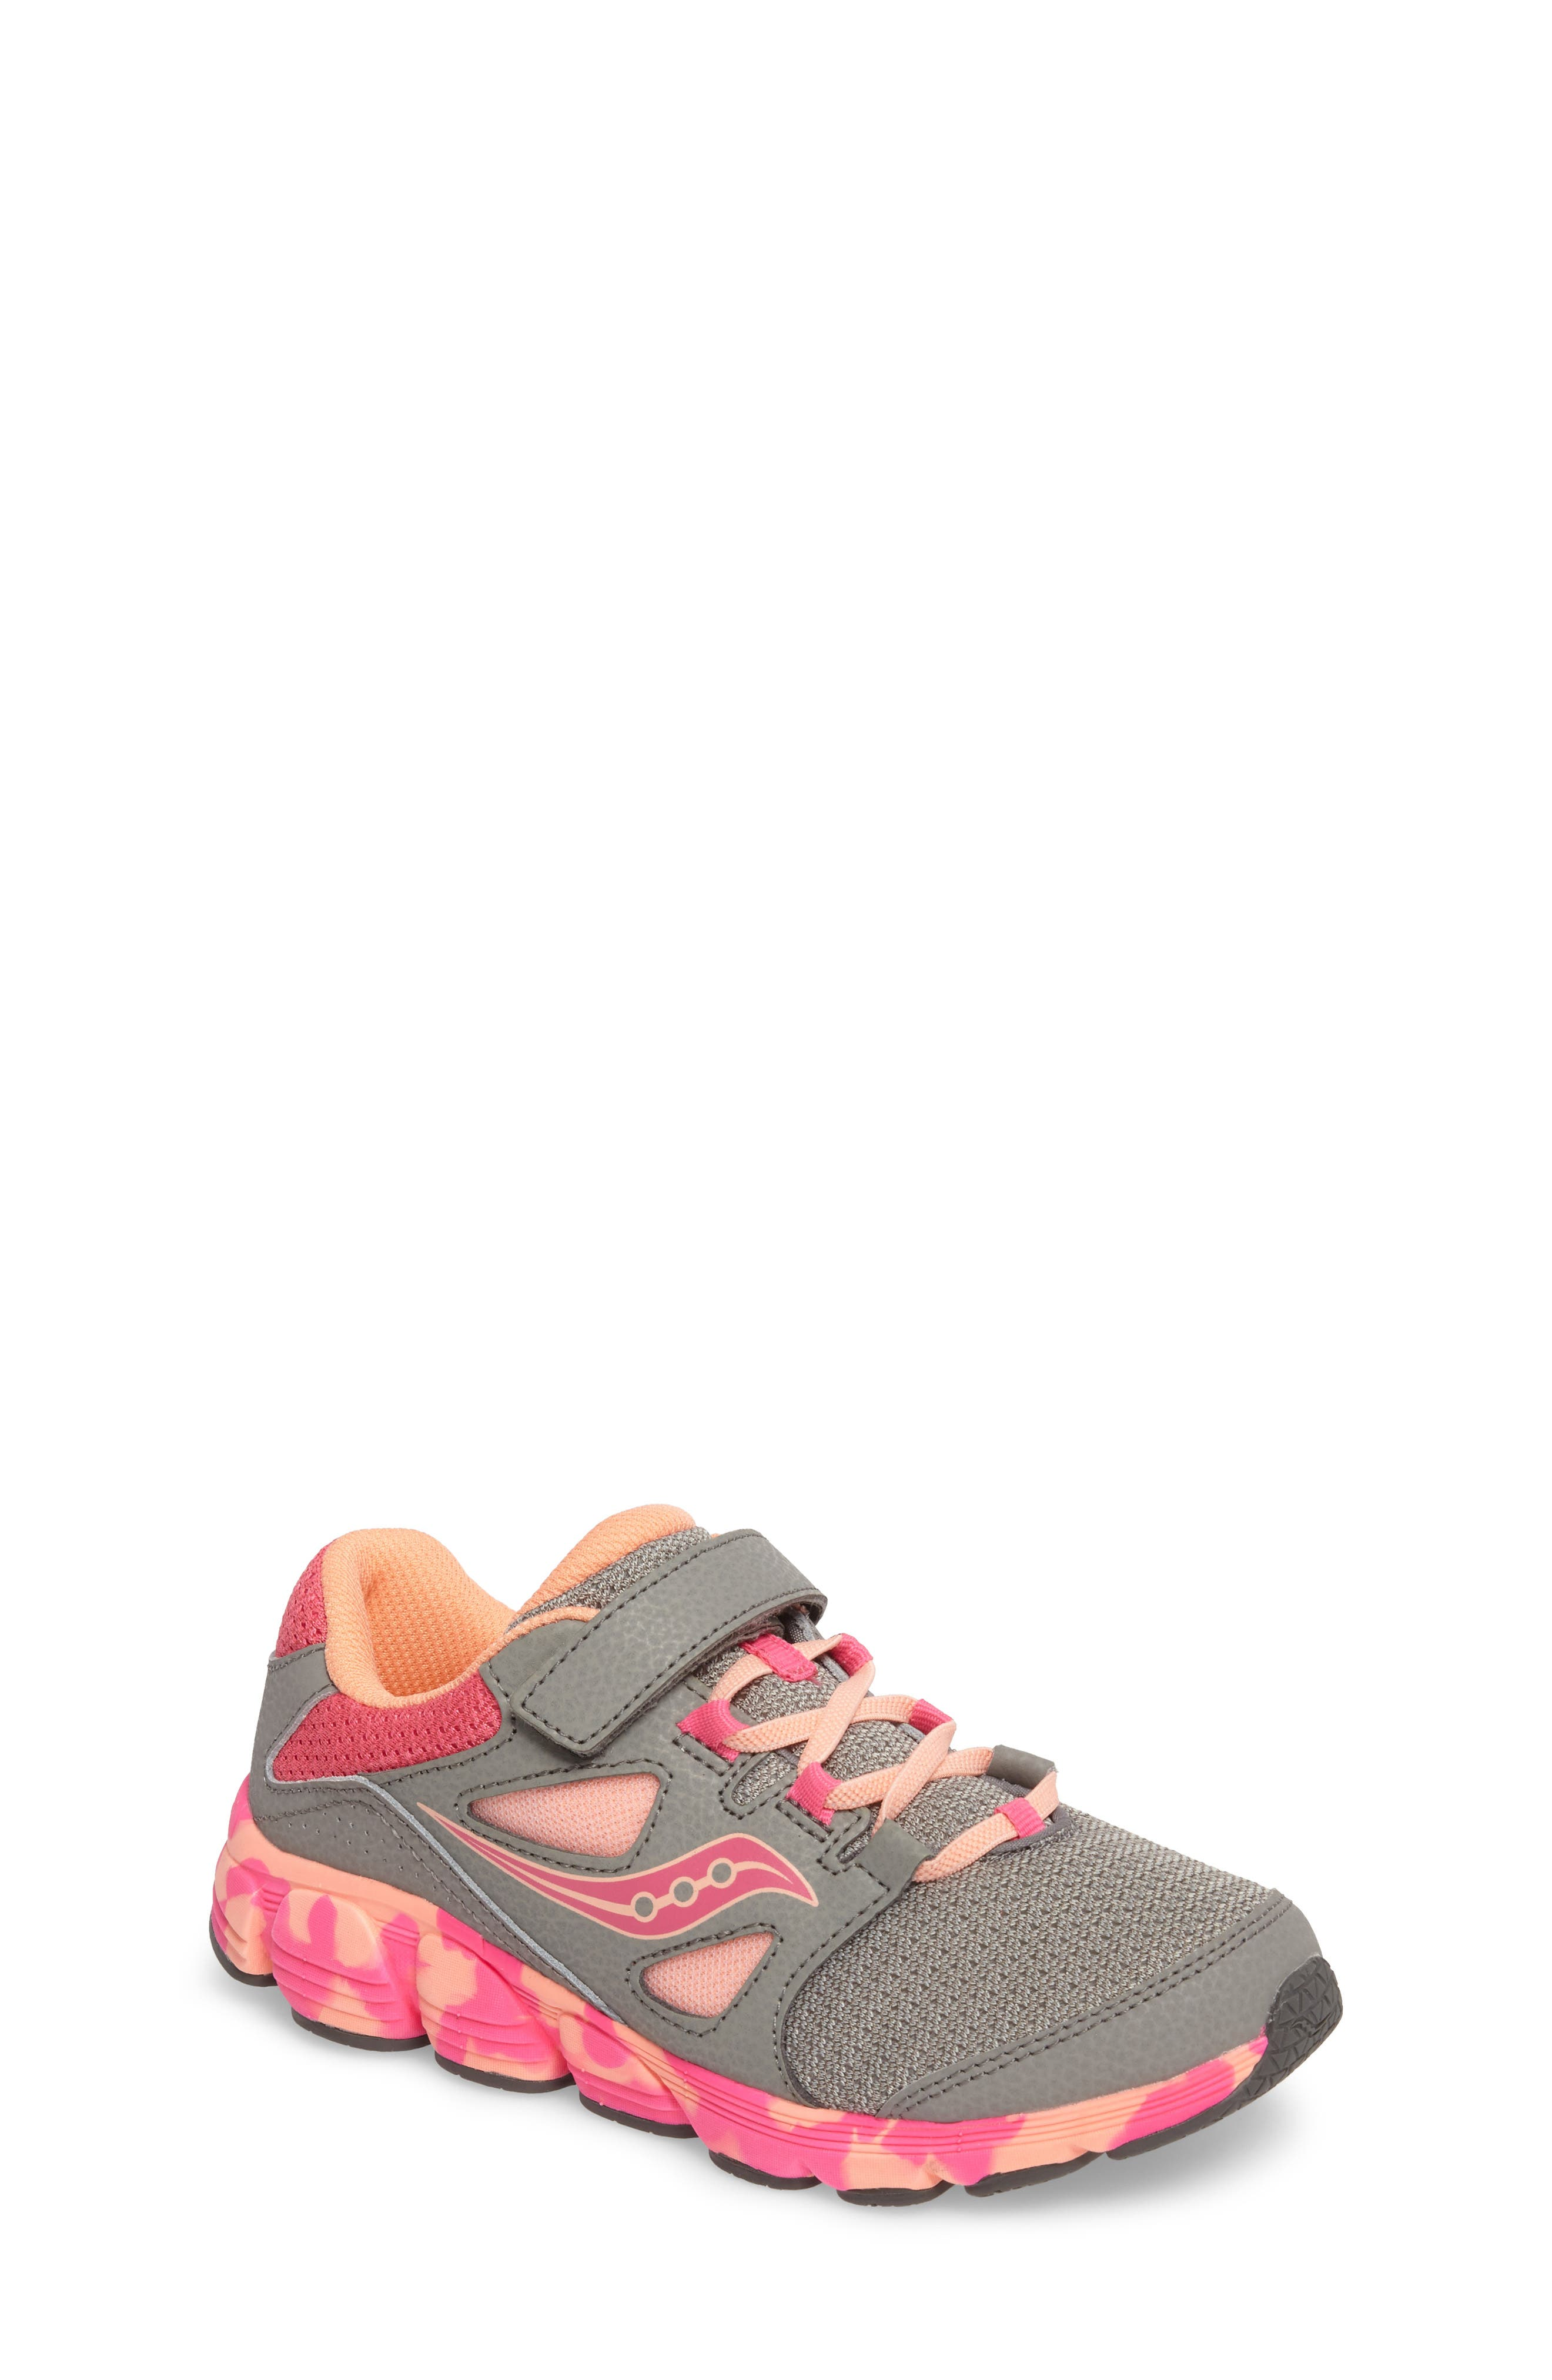 Kotaro 4 Sneaker,                             Main thumbnail 1, color,                             020